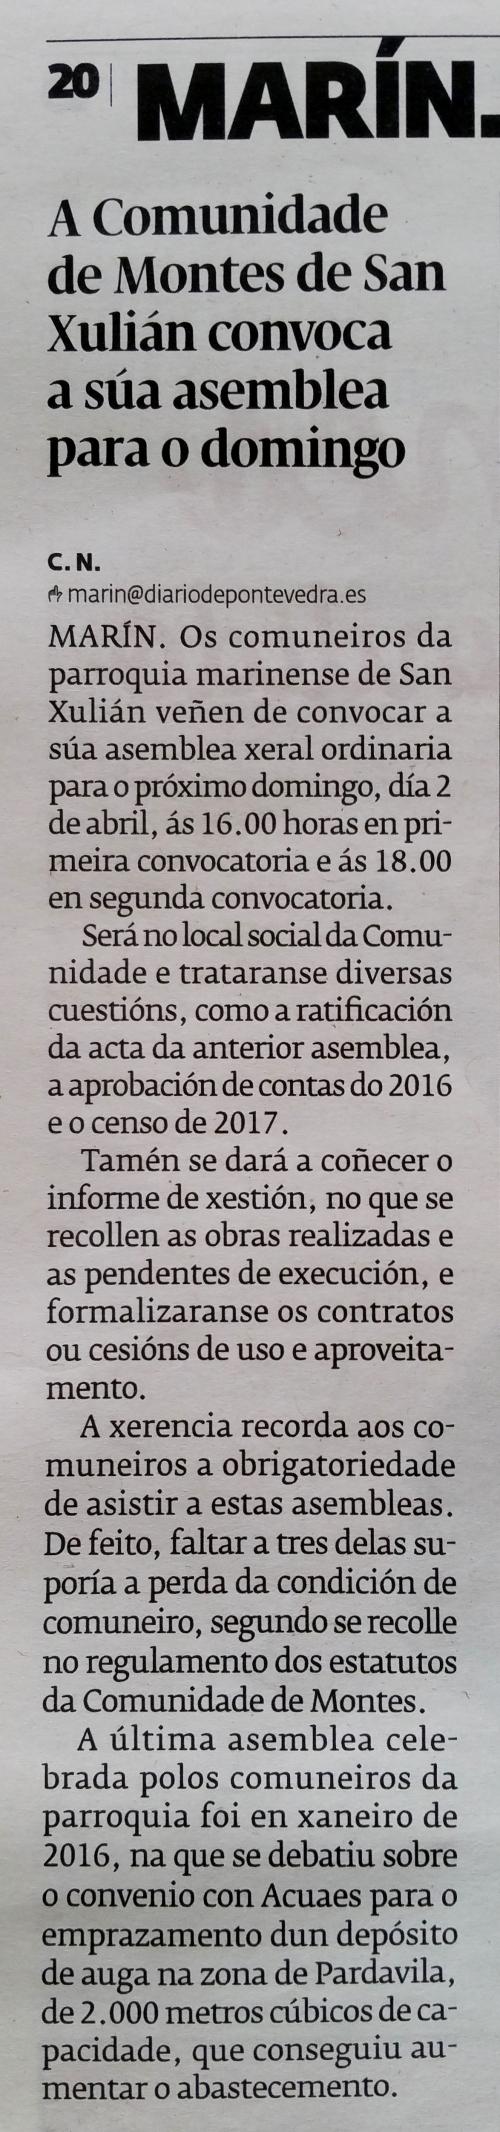 Diario, 28 marzo 2017